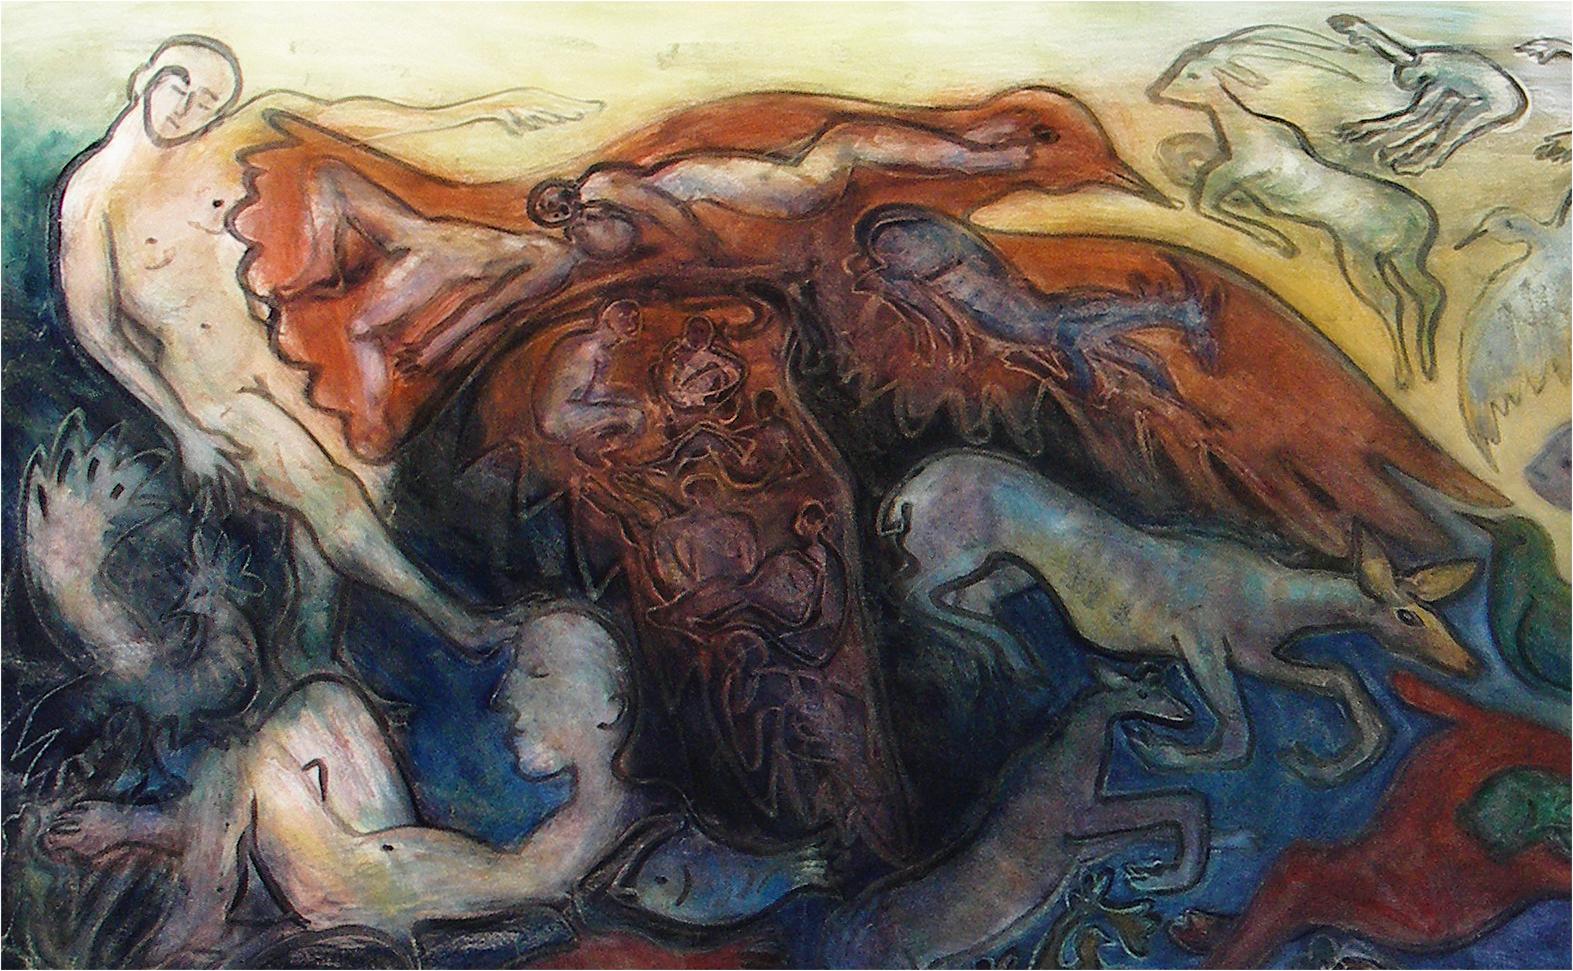 07_Geburt des Ikarus, Detail 5.tif